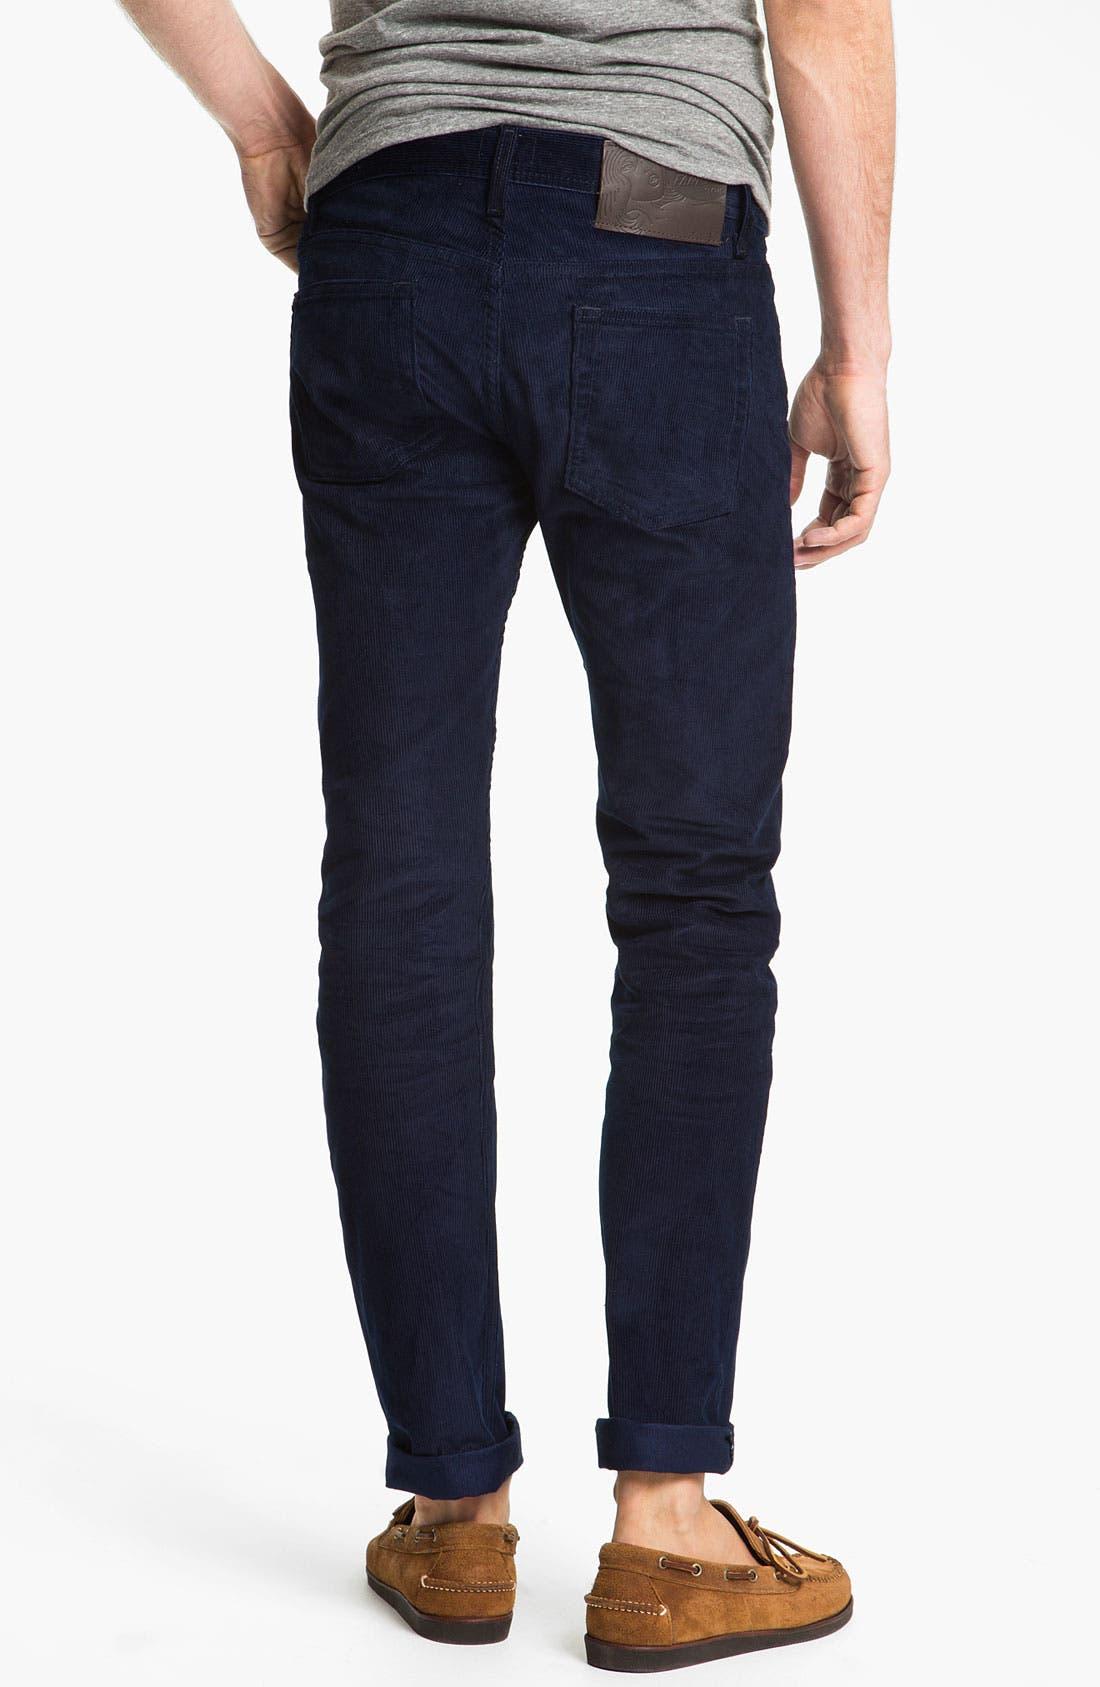 Alternate Image 1 Selected - Naked & Famous Denim 'Weird Guy' Slim Tapered Leg Corduroy Pants